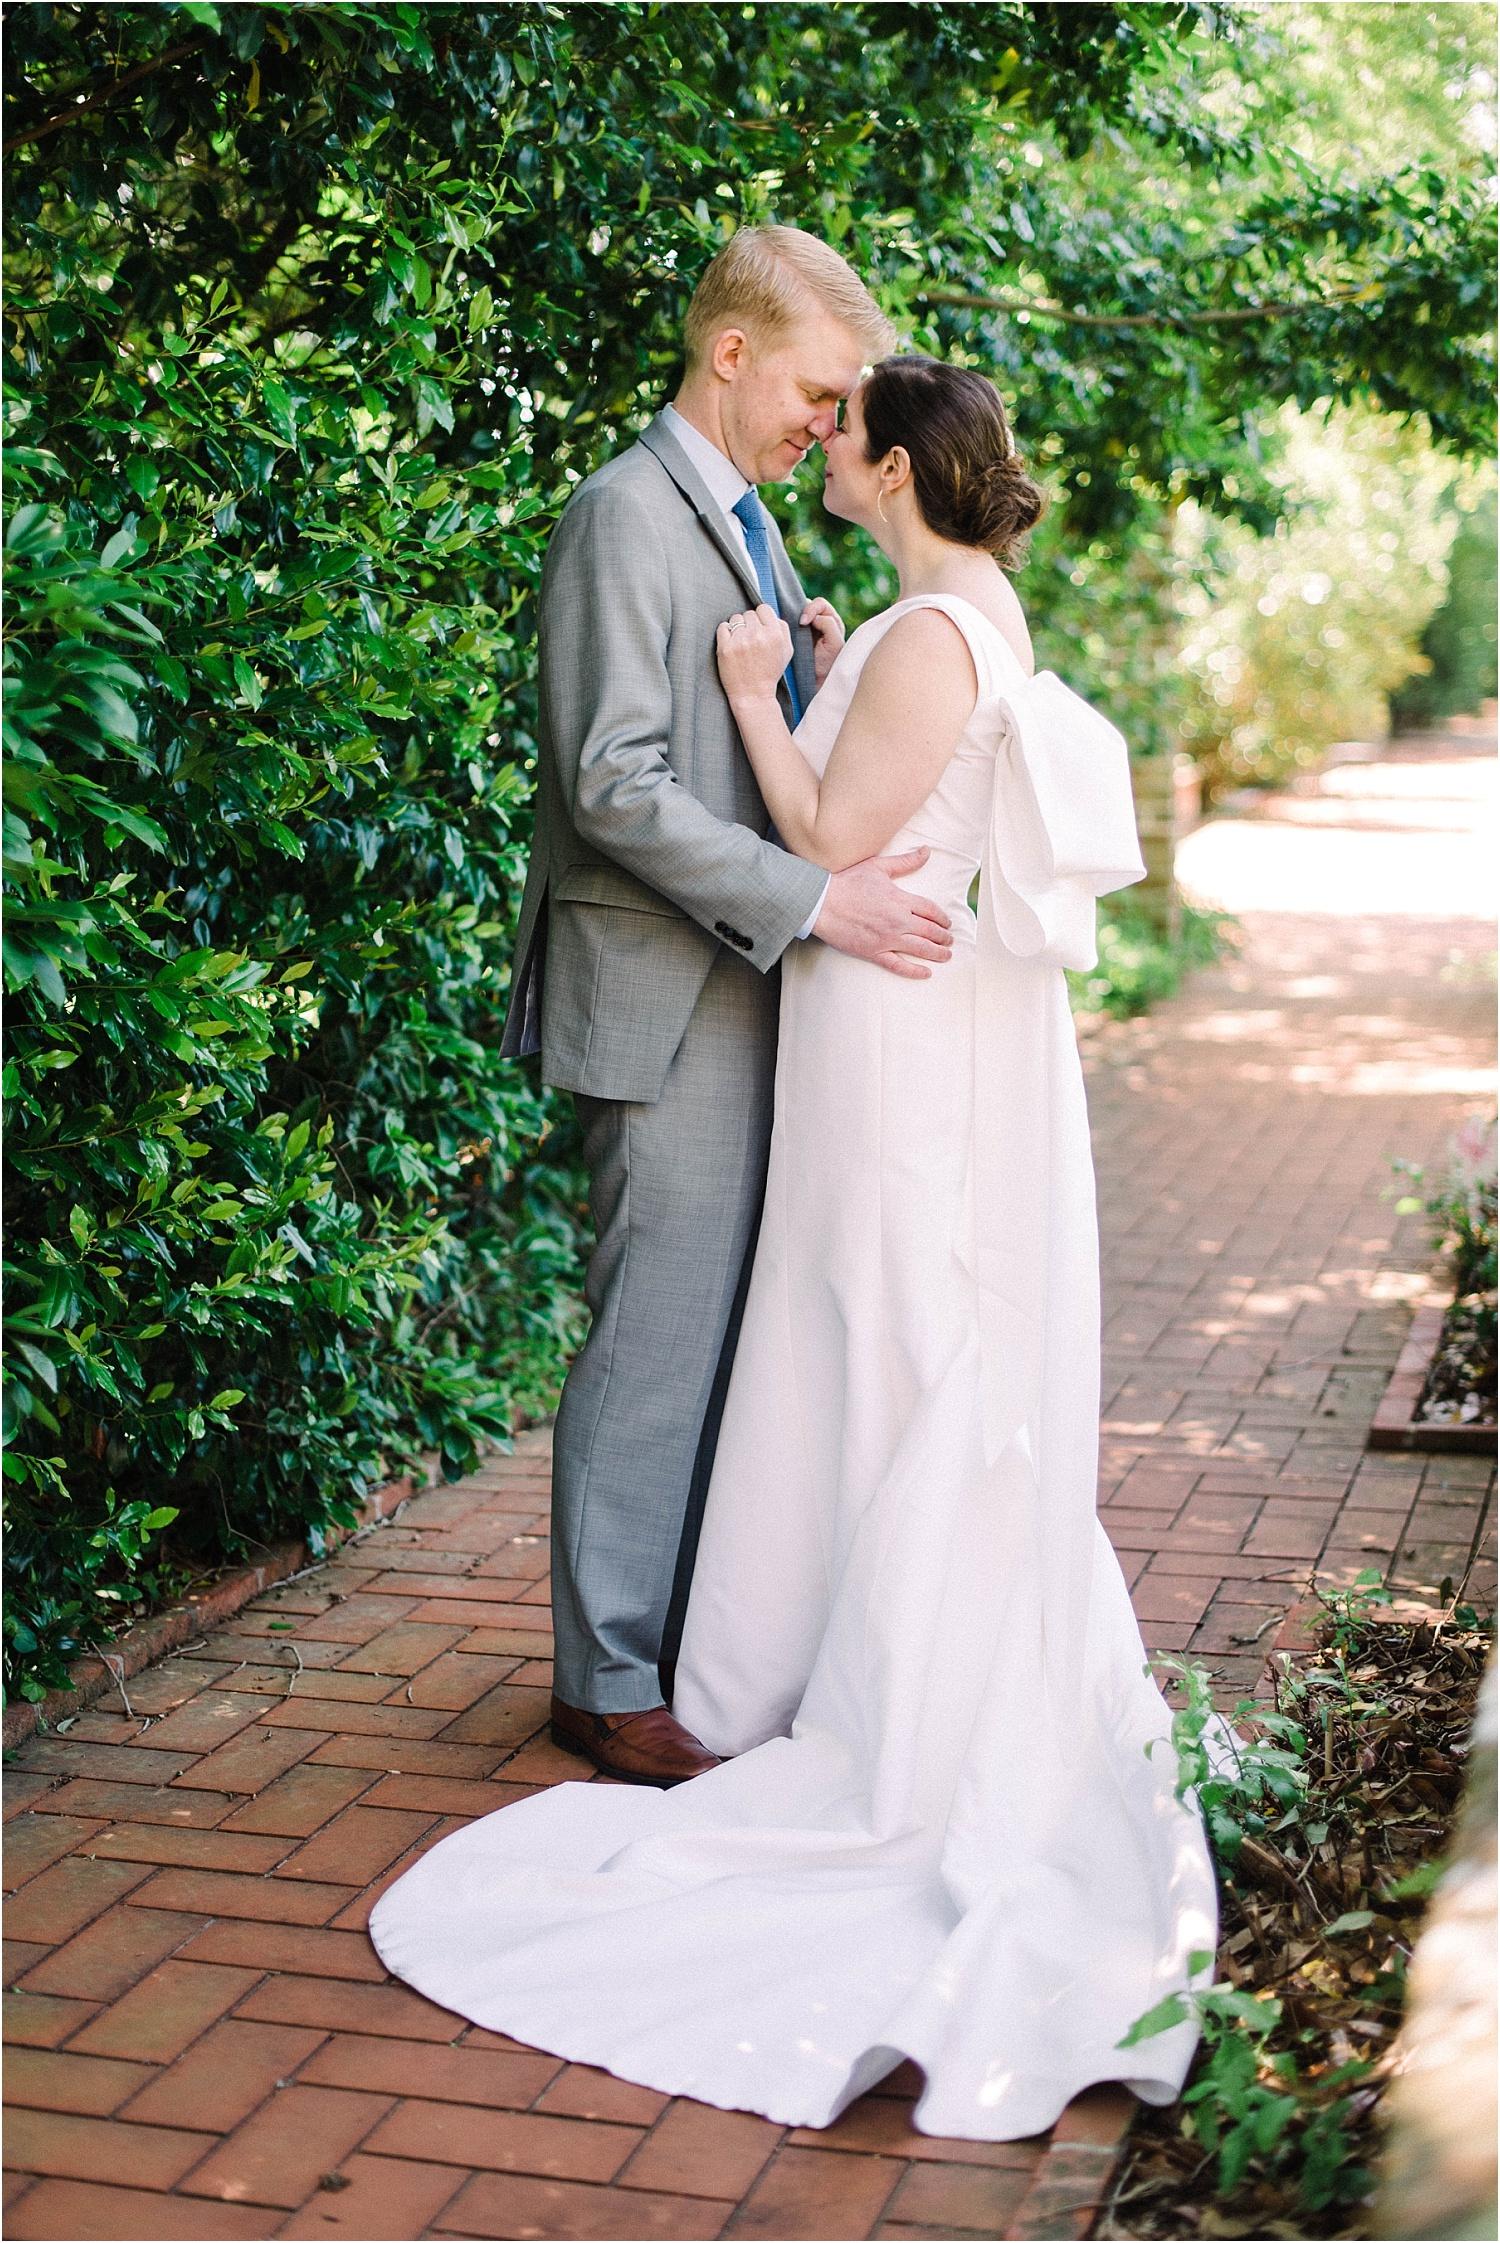 Heather + Scott-Longue-Vue-house-and-gardens-black-tie-wedding-photos_Gabby Chapin_Print_0118_BLOG.jpg